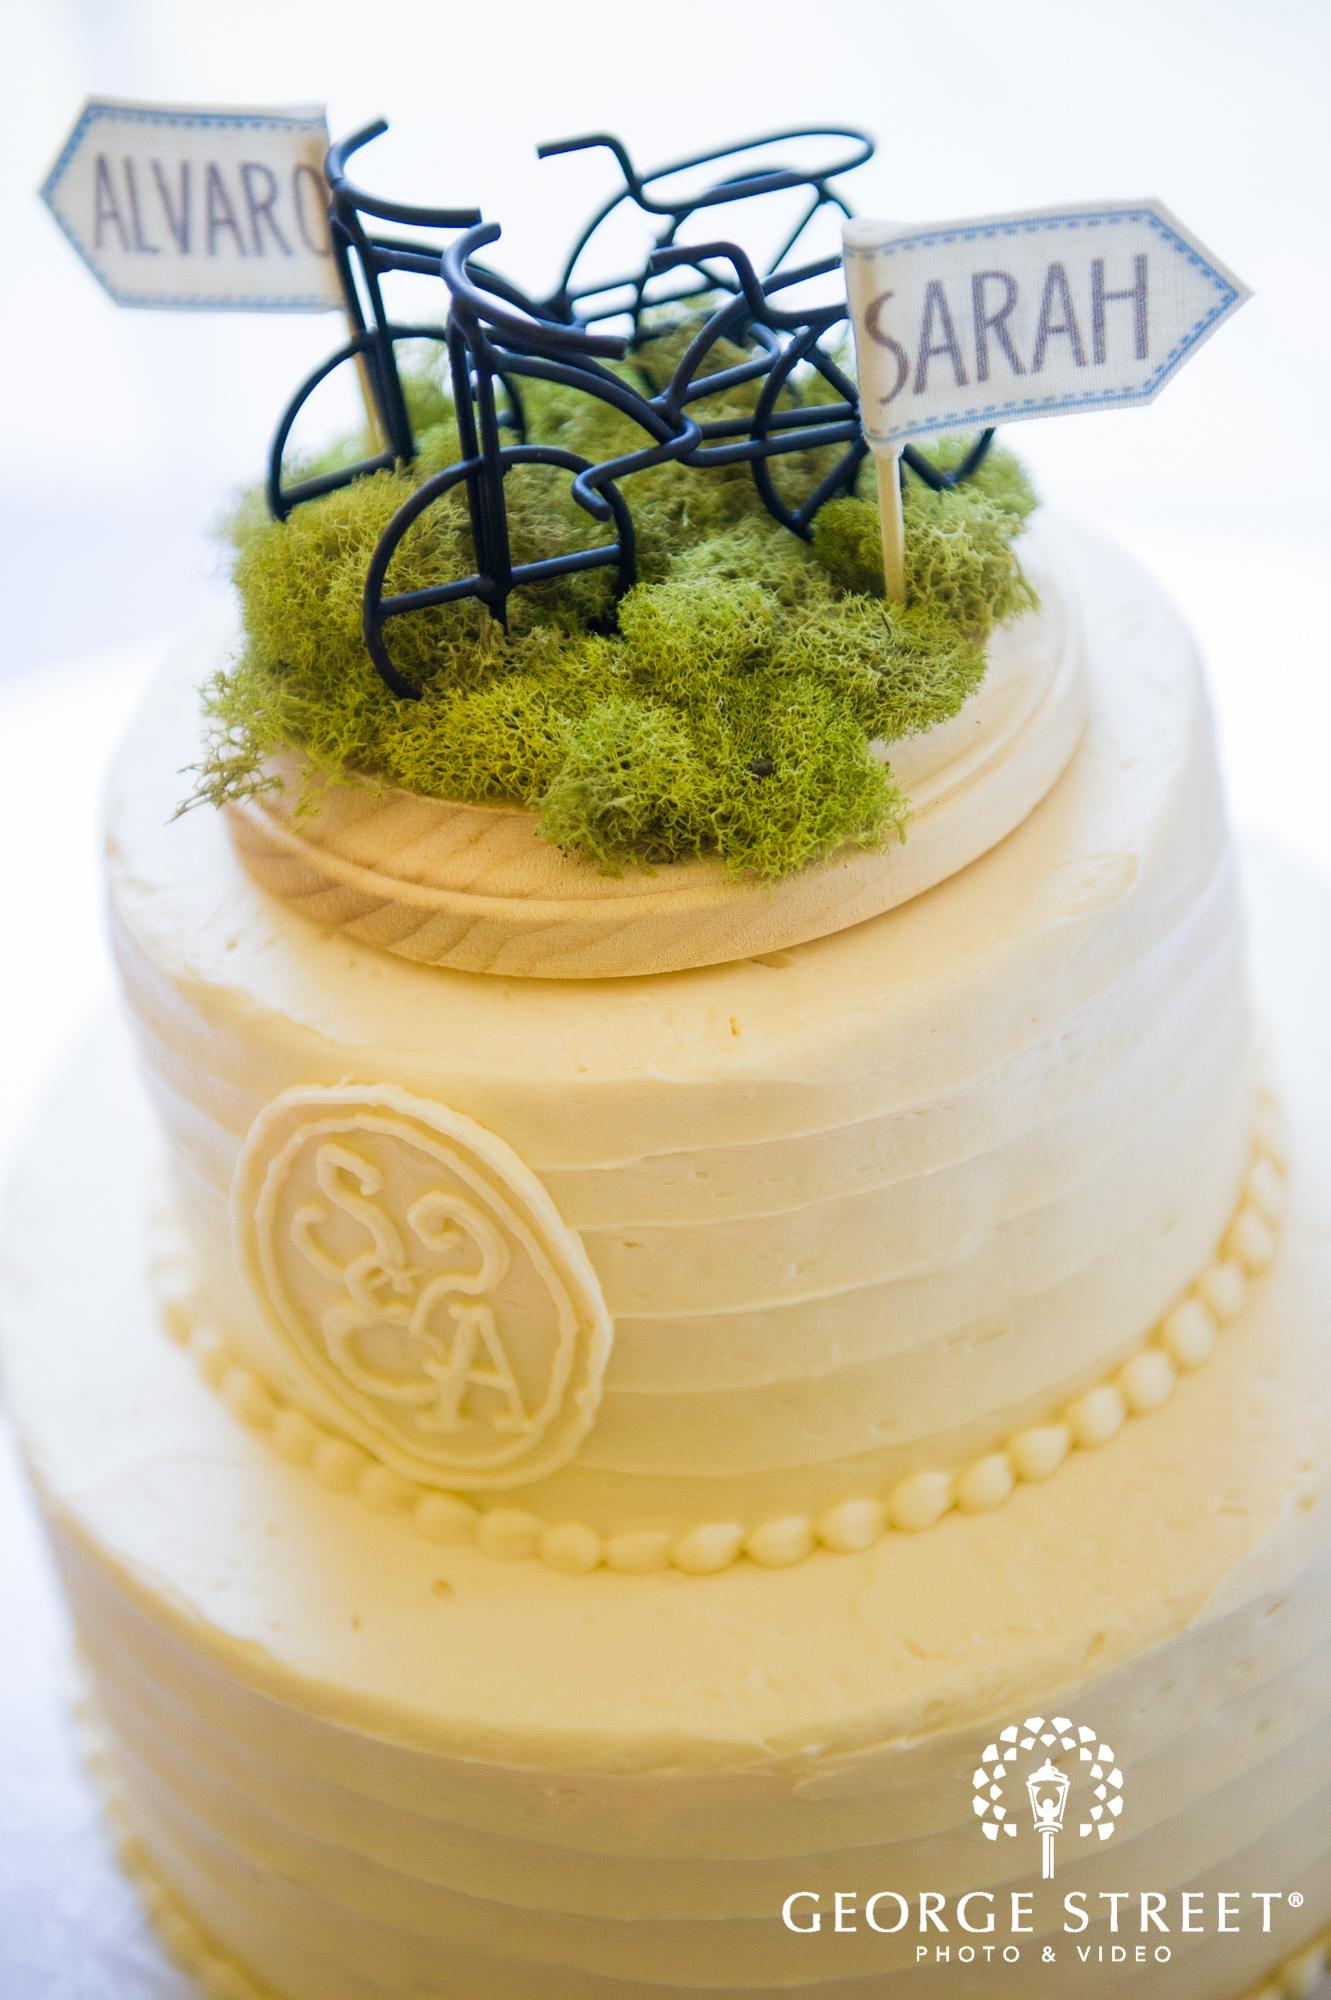 Calamigos Ranch Wedding Photographer | George Street Photo & Video ...